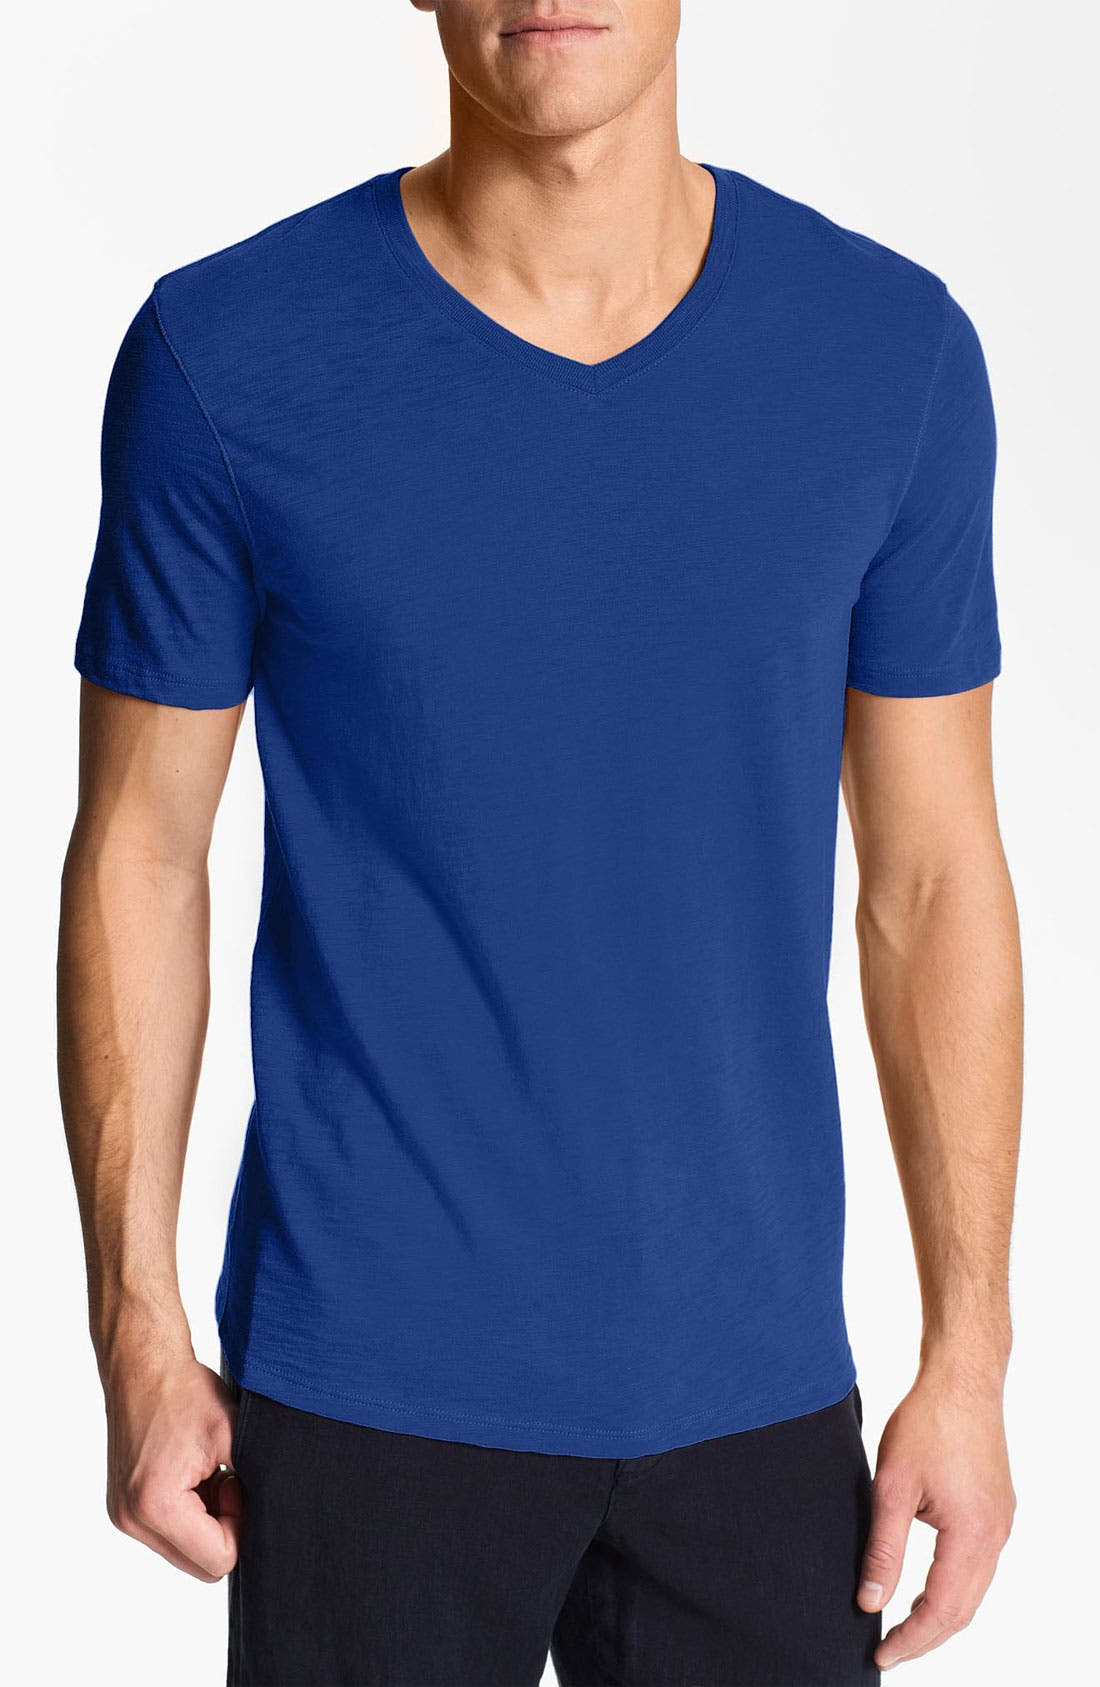 Alternate Image 1 Selected - Vince V-Neck Slub Knit T-Shirt